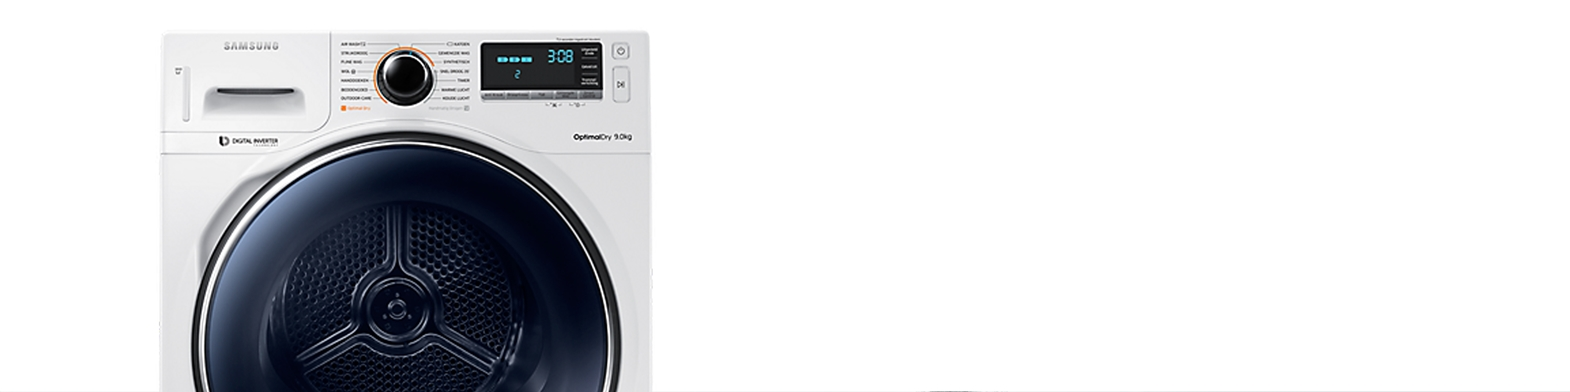 Samsung_Droger-sfeerbeeld-4000x1000